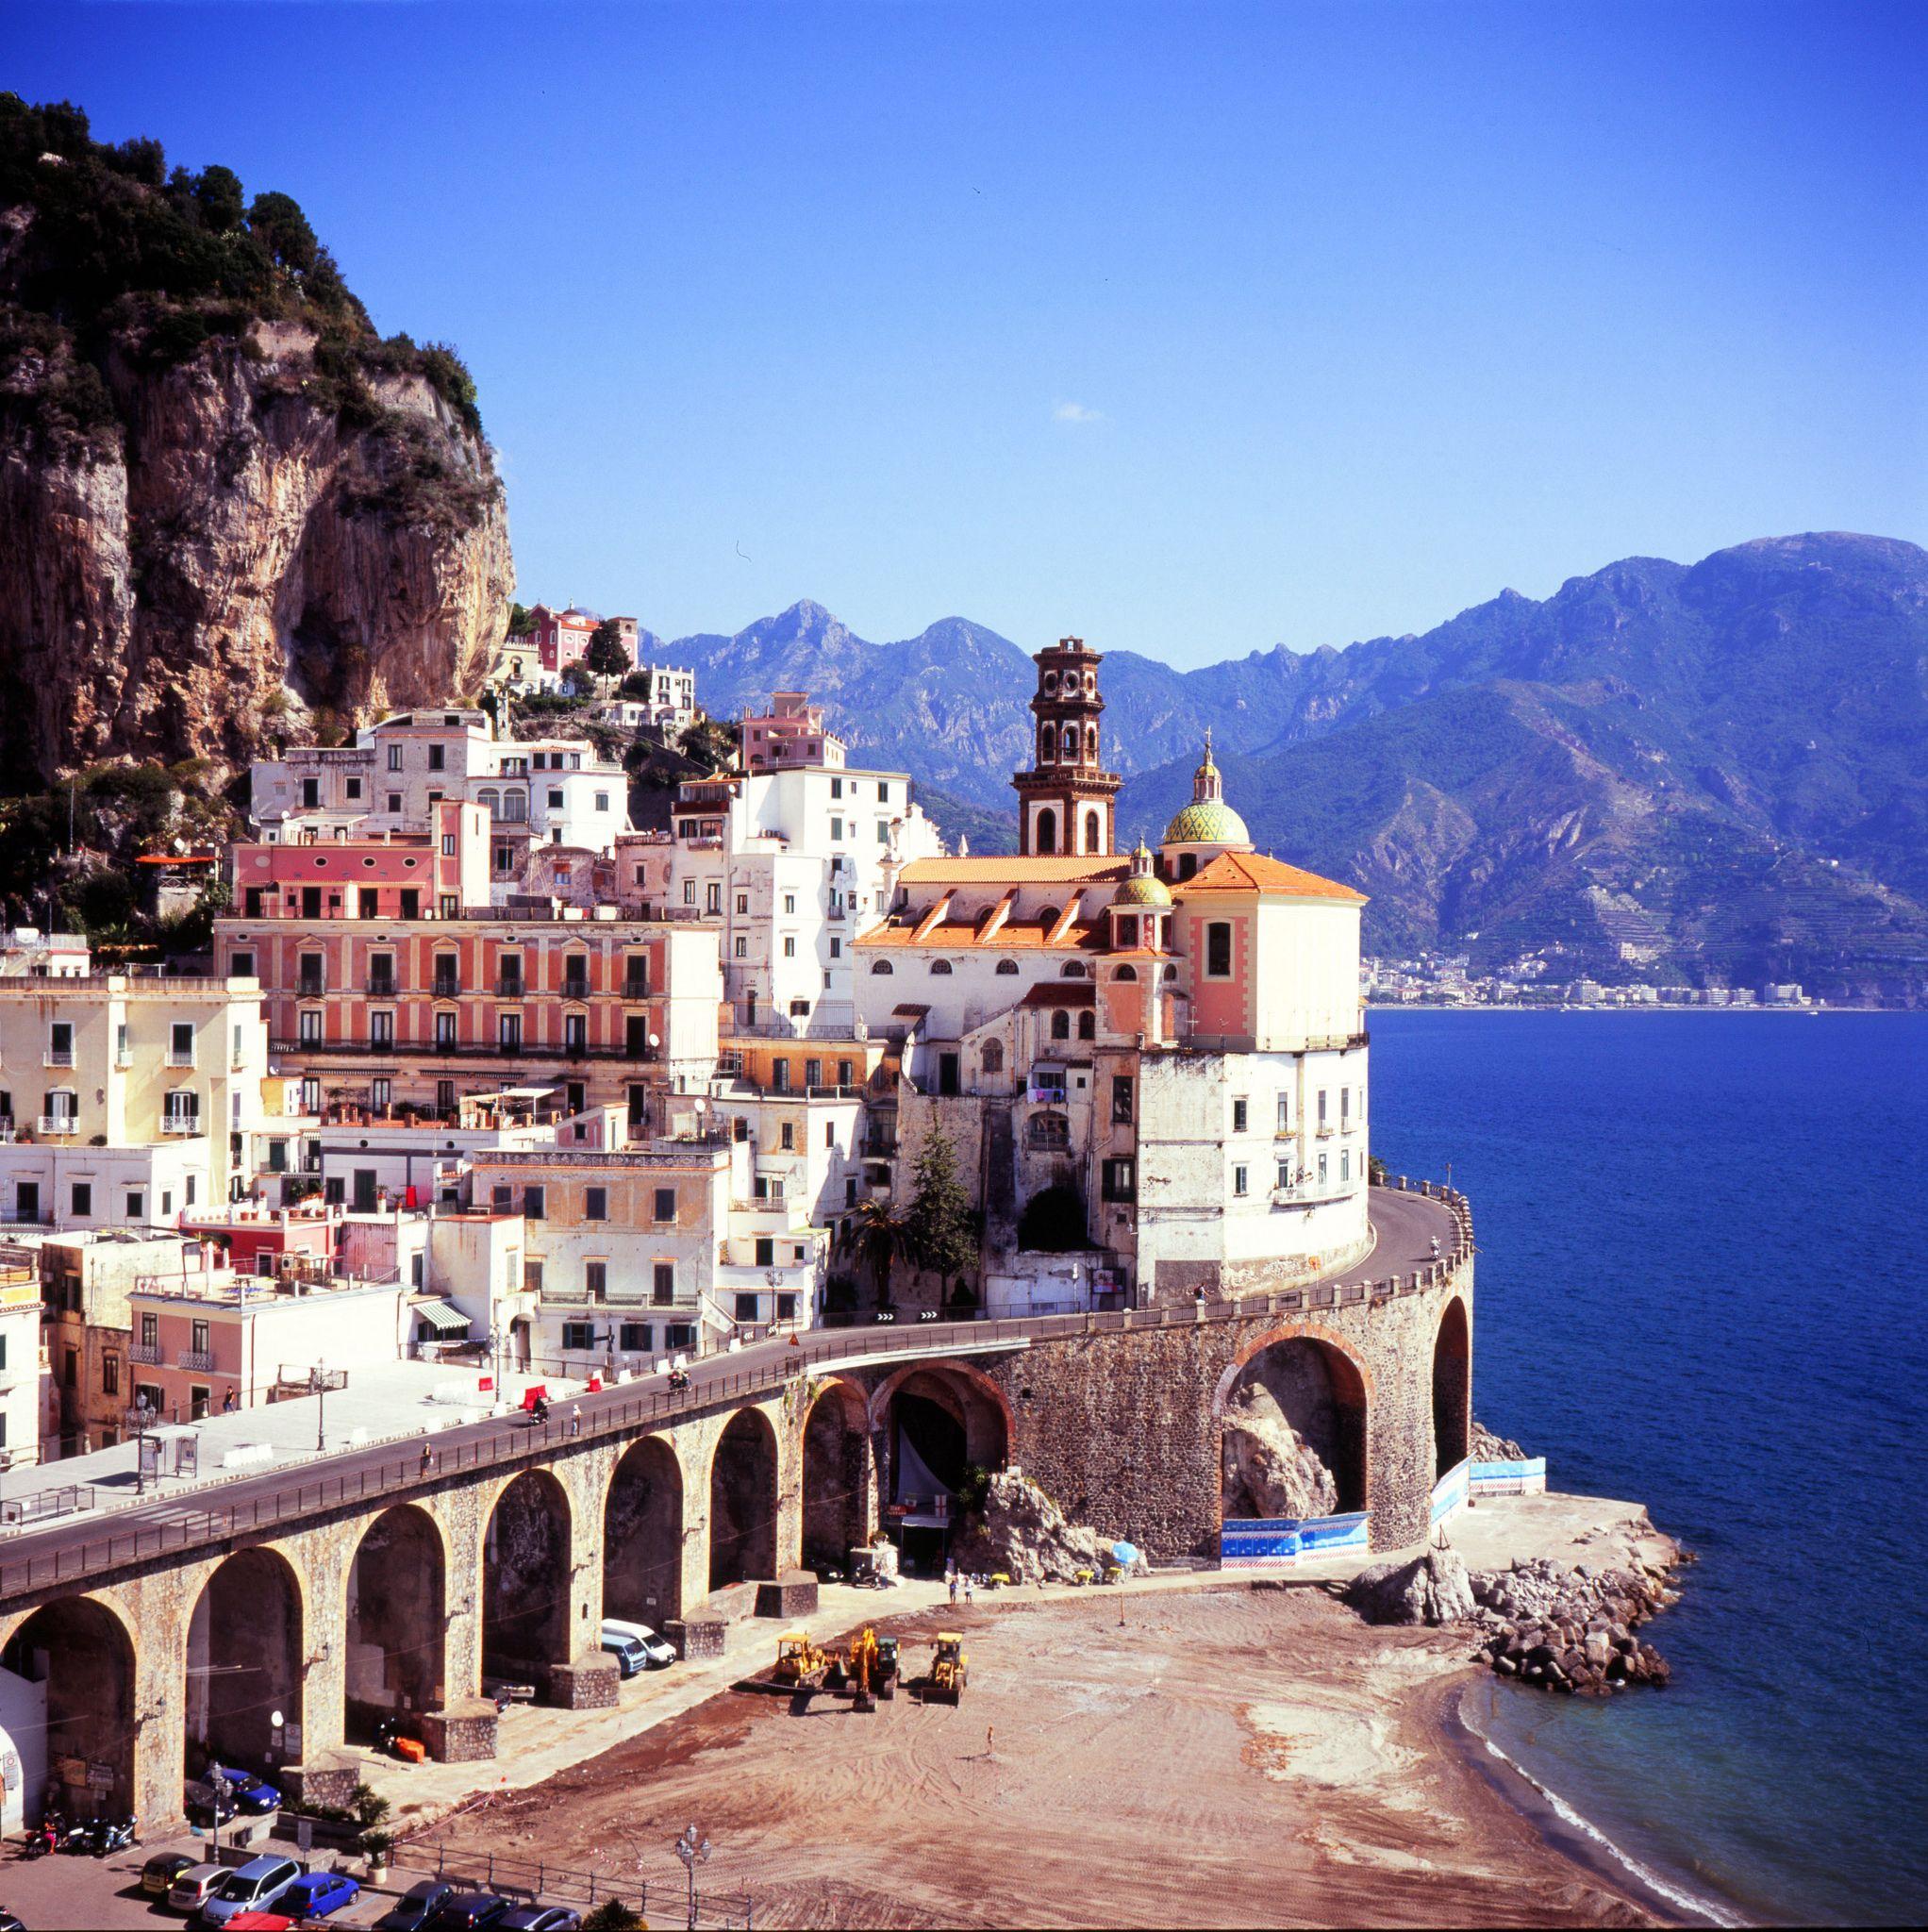 https://flic.kr/p/bwYgvN | Small town on the Amalfi Coast